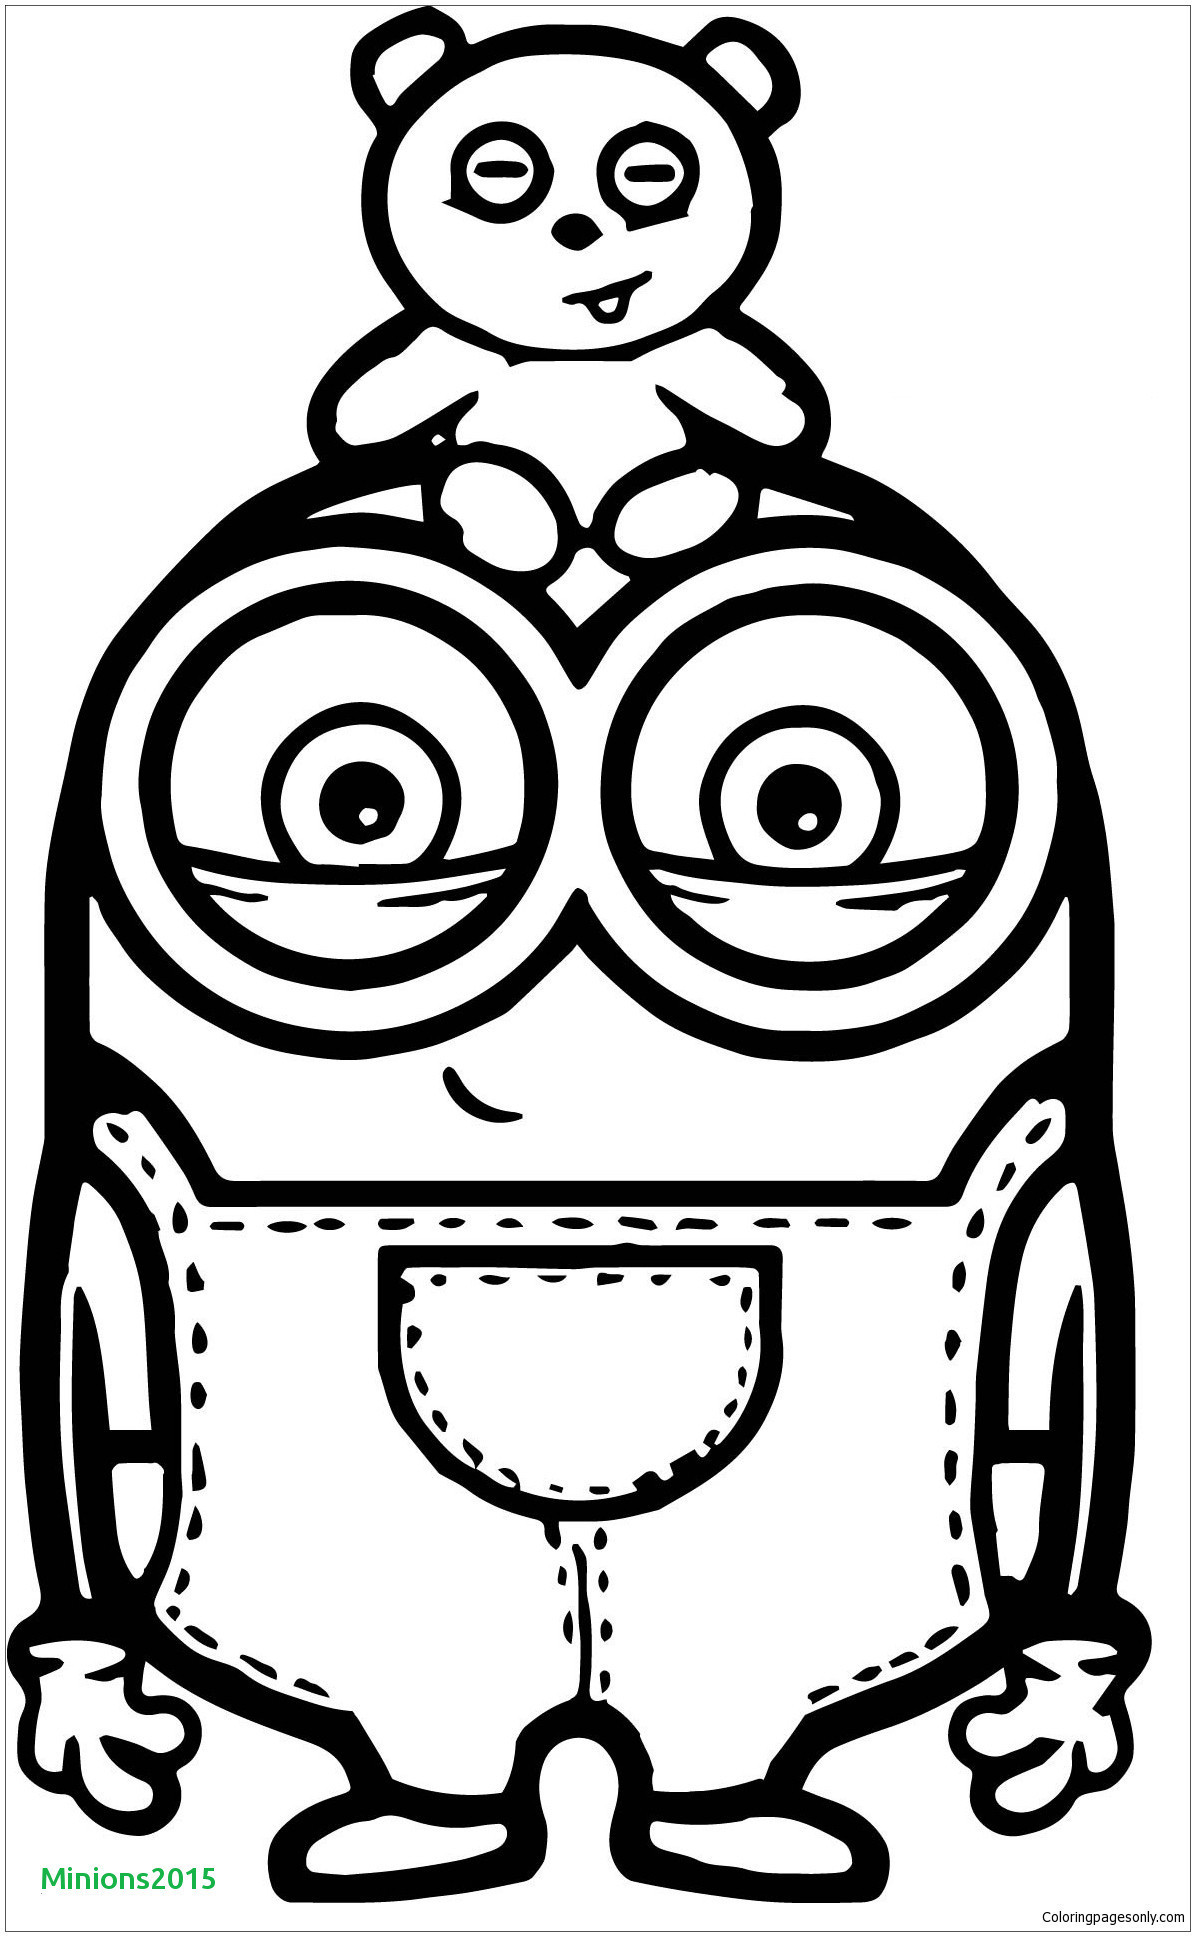 Minions Ausmalbilder Bob Teddy Frisch 40 Minions Ausmalbilder Bob Scoredatscore Elegant Minions Stock